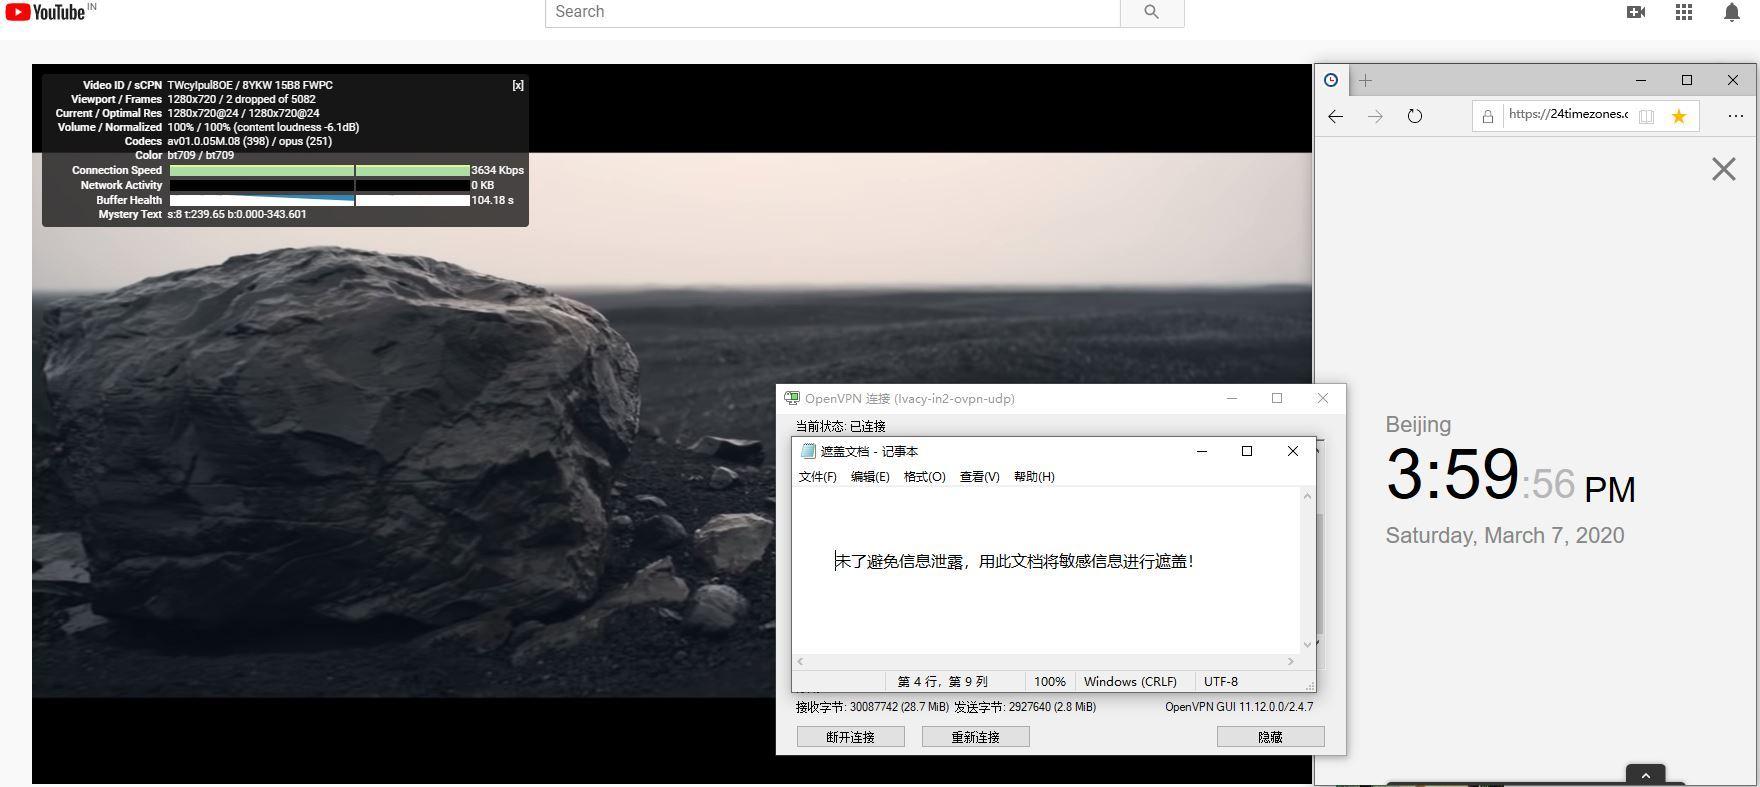 Windows10-IvacyVPN-OpenVPN-IN2-中国VPN翻墙-科学上网-Youtube测速-20200307.jpg